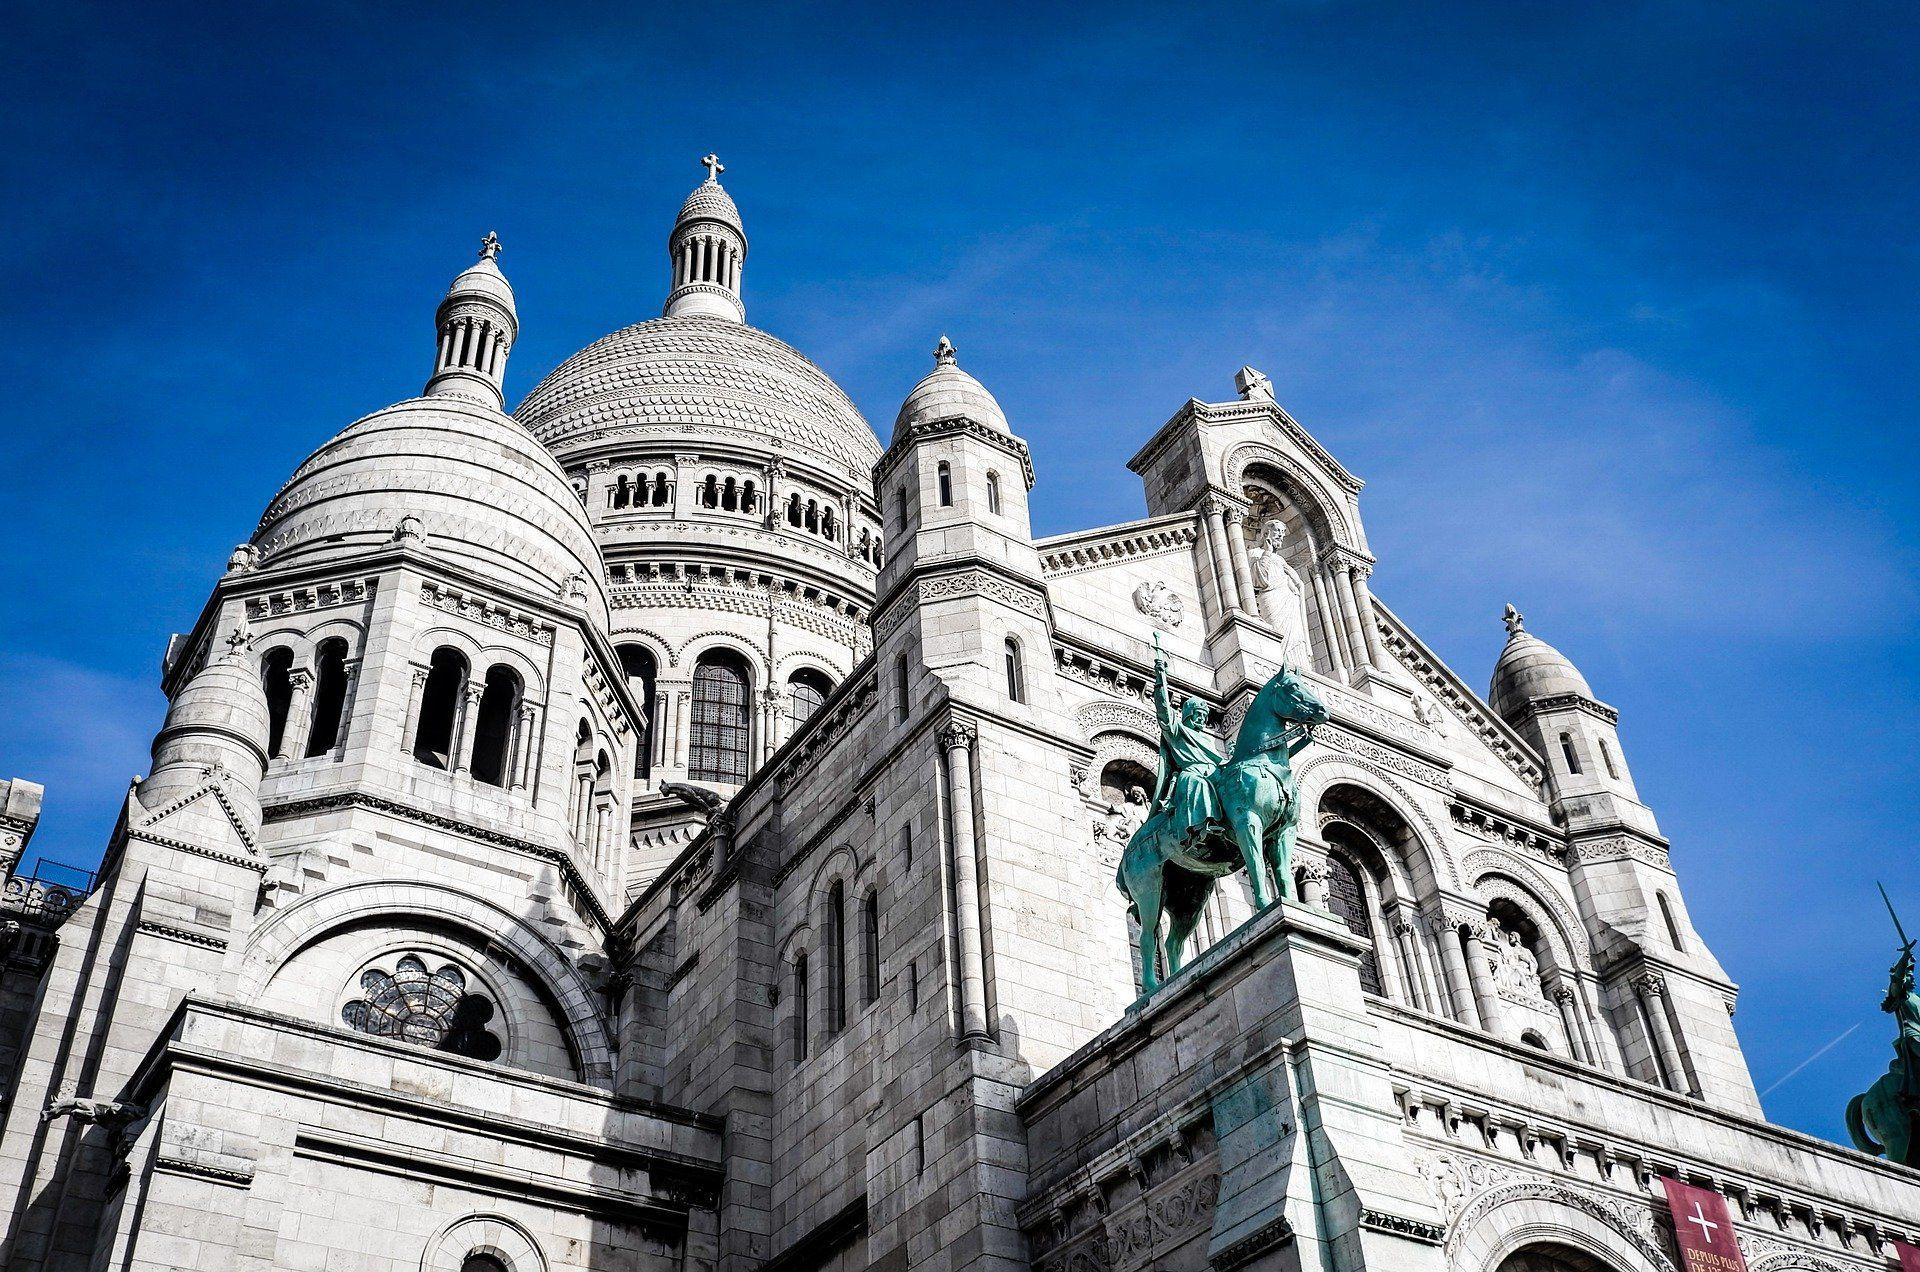 Hotel-pavillon monmartre-visiter-1